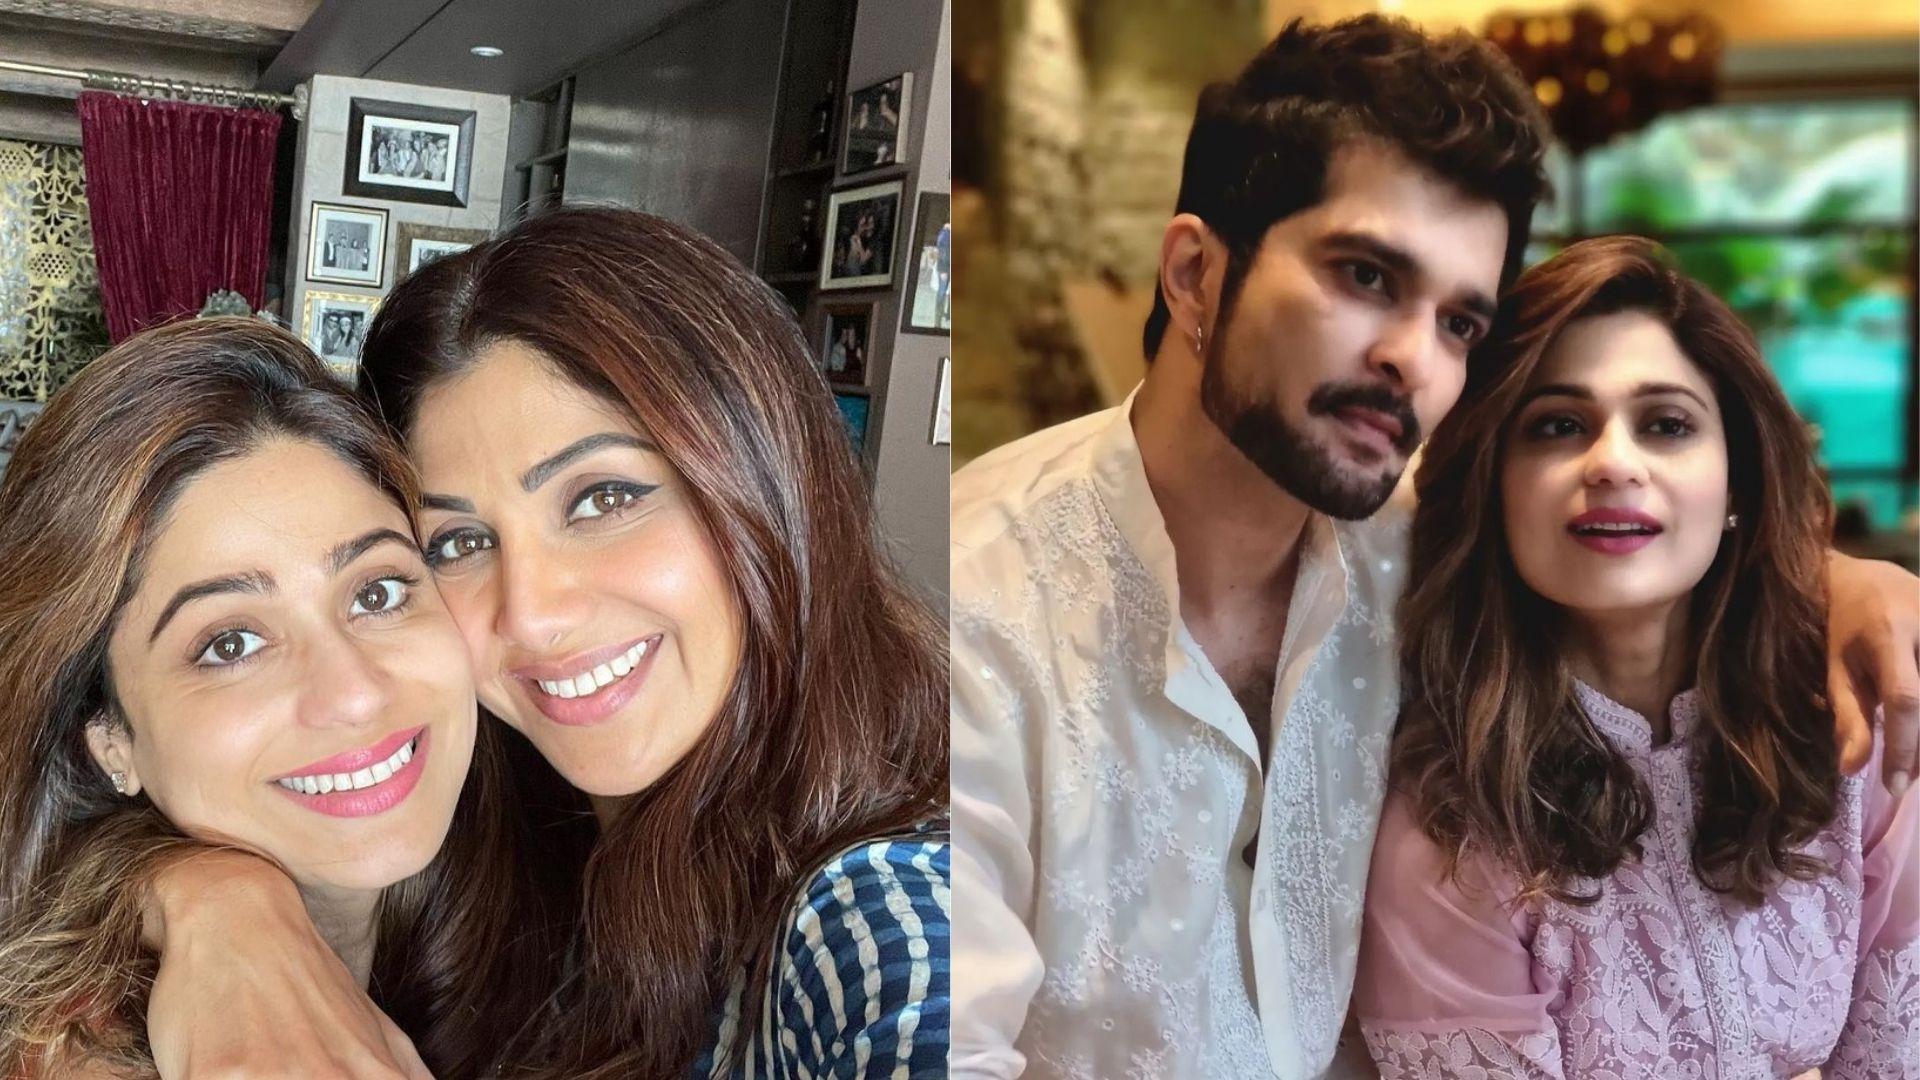 Bigg Boss 15: Confirmed Contestant Shamita Shetty's BF Raqesh Bapat Confirms Meeting Shilpa Shetty And Their Mom; Gives An Epic Reply